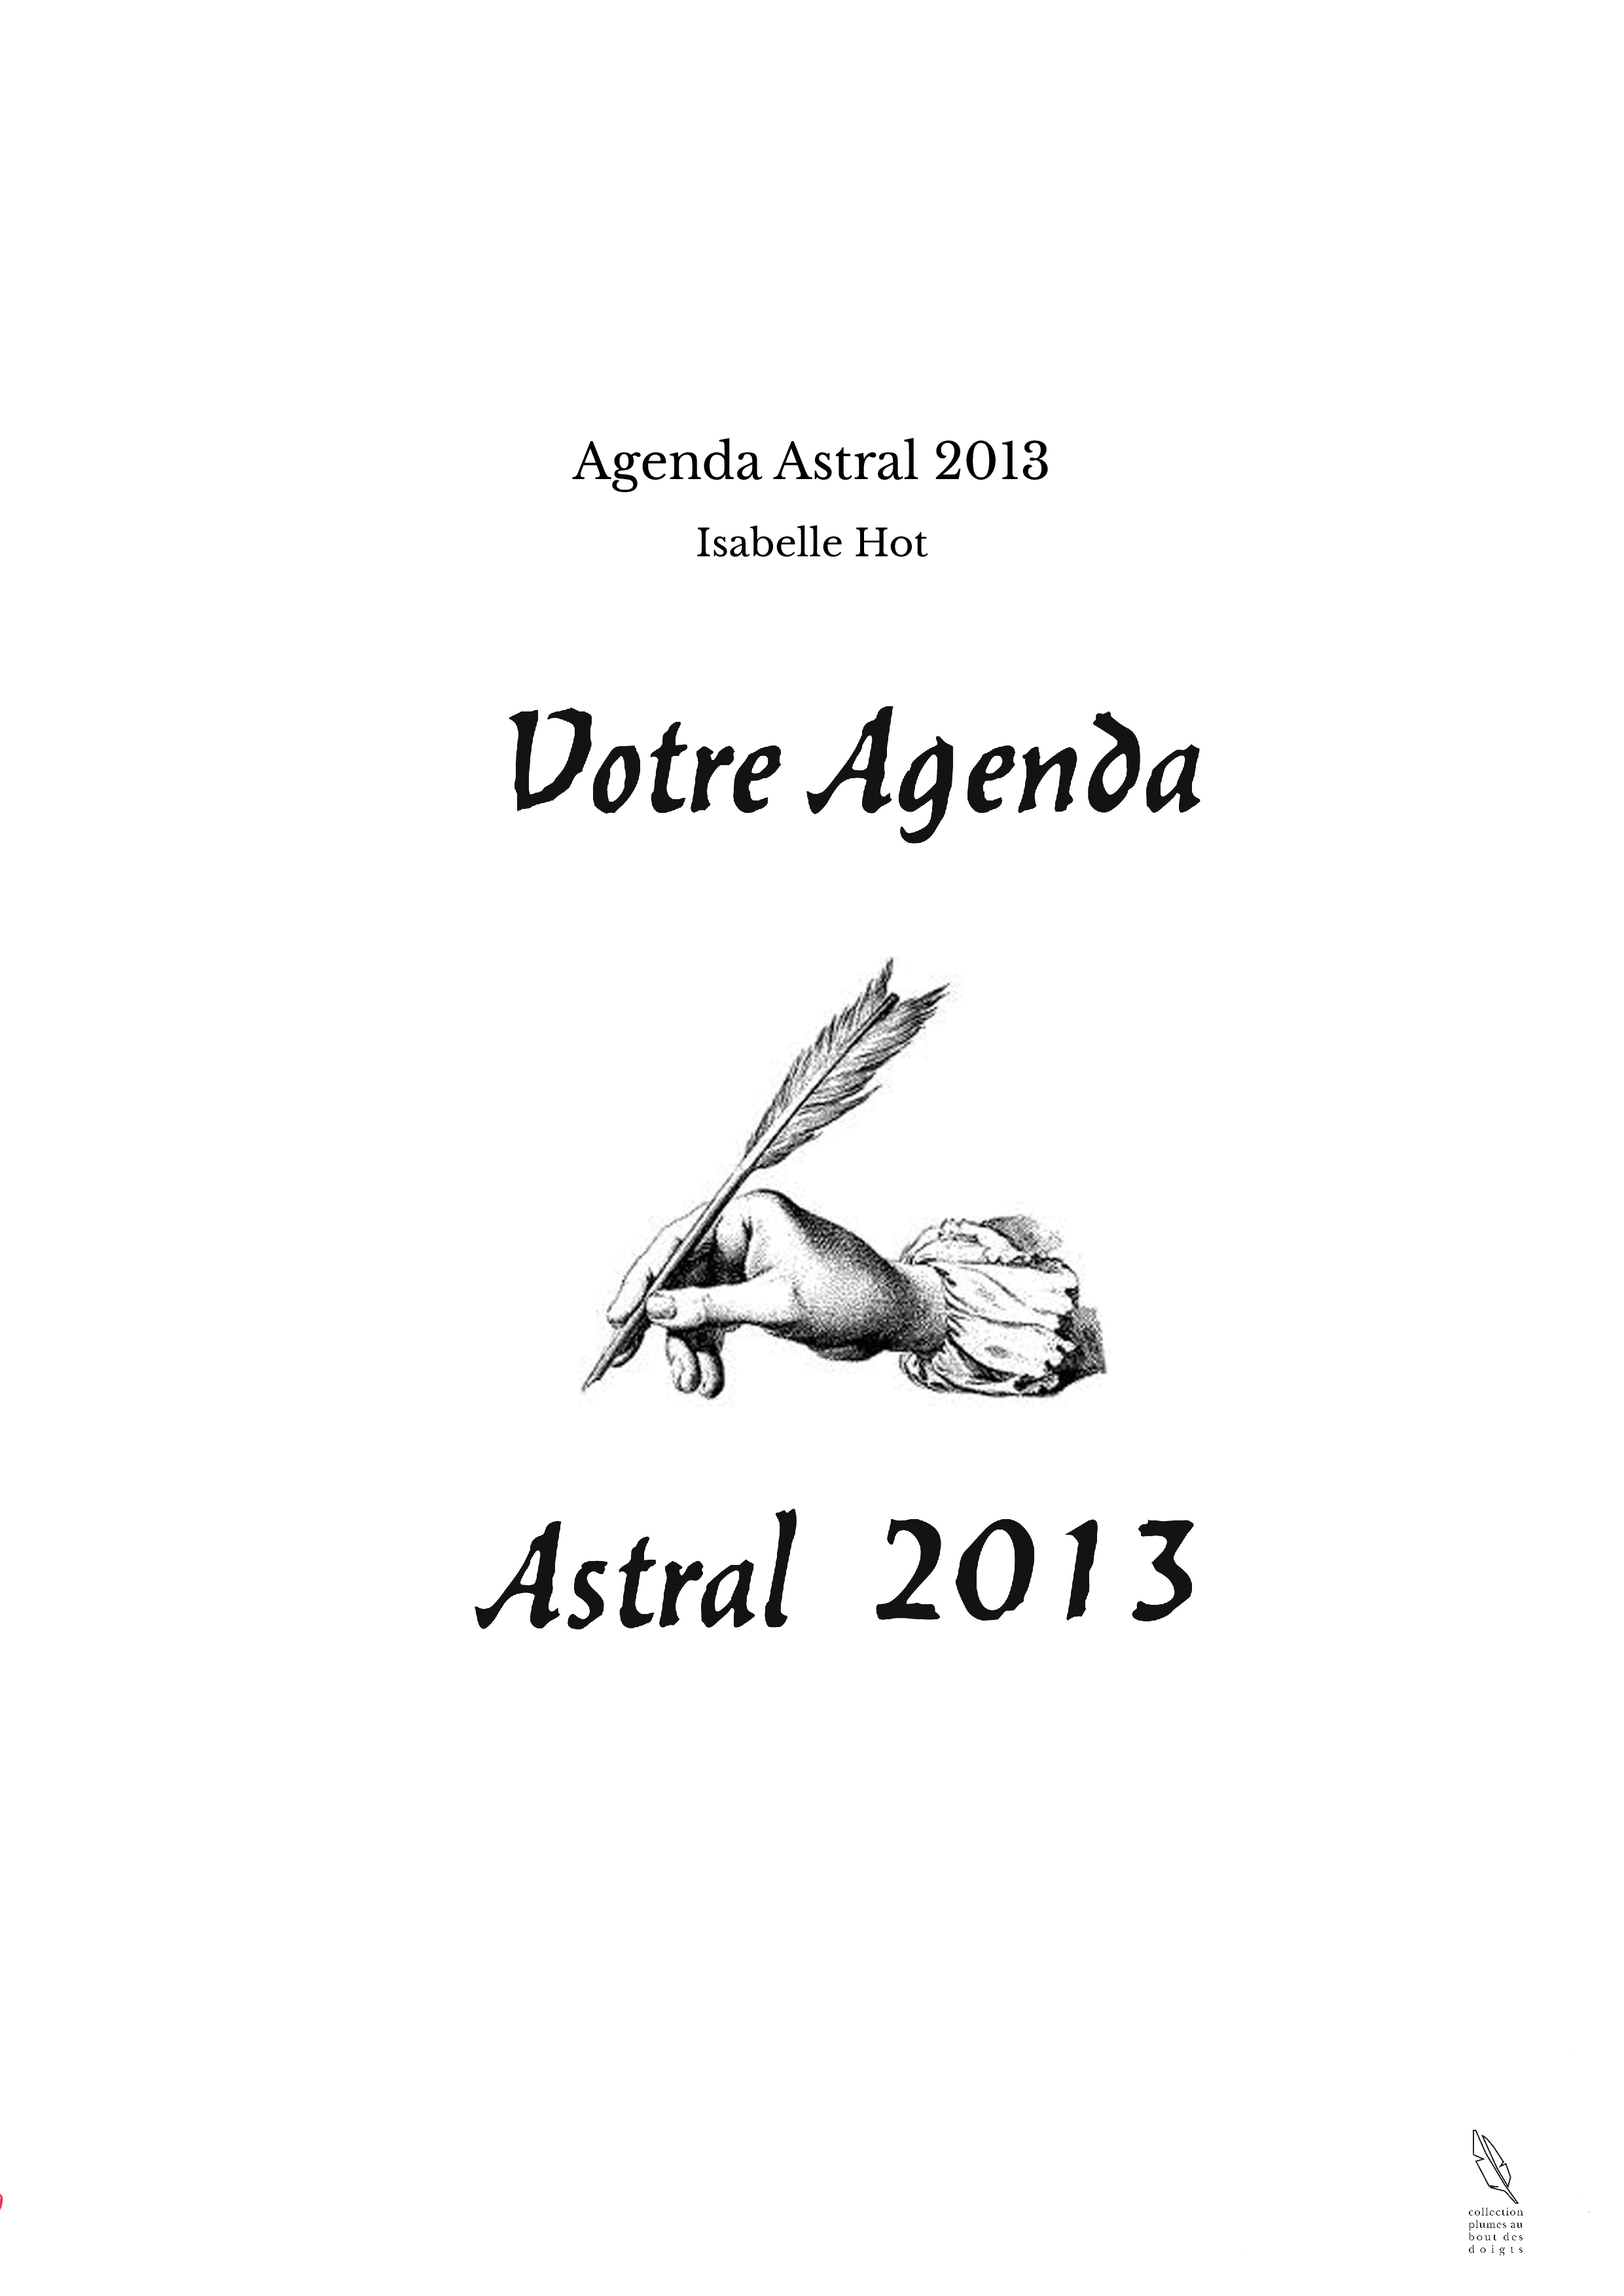 Agenda Astral 2013